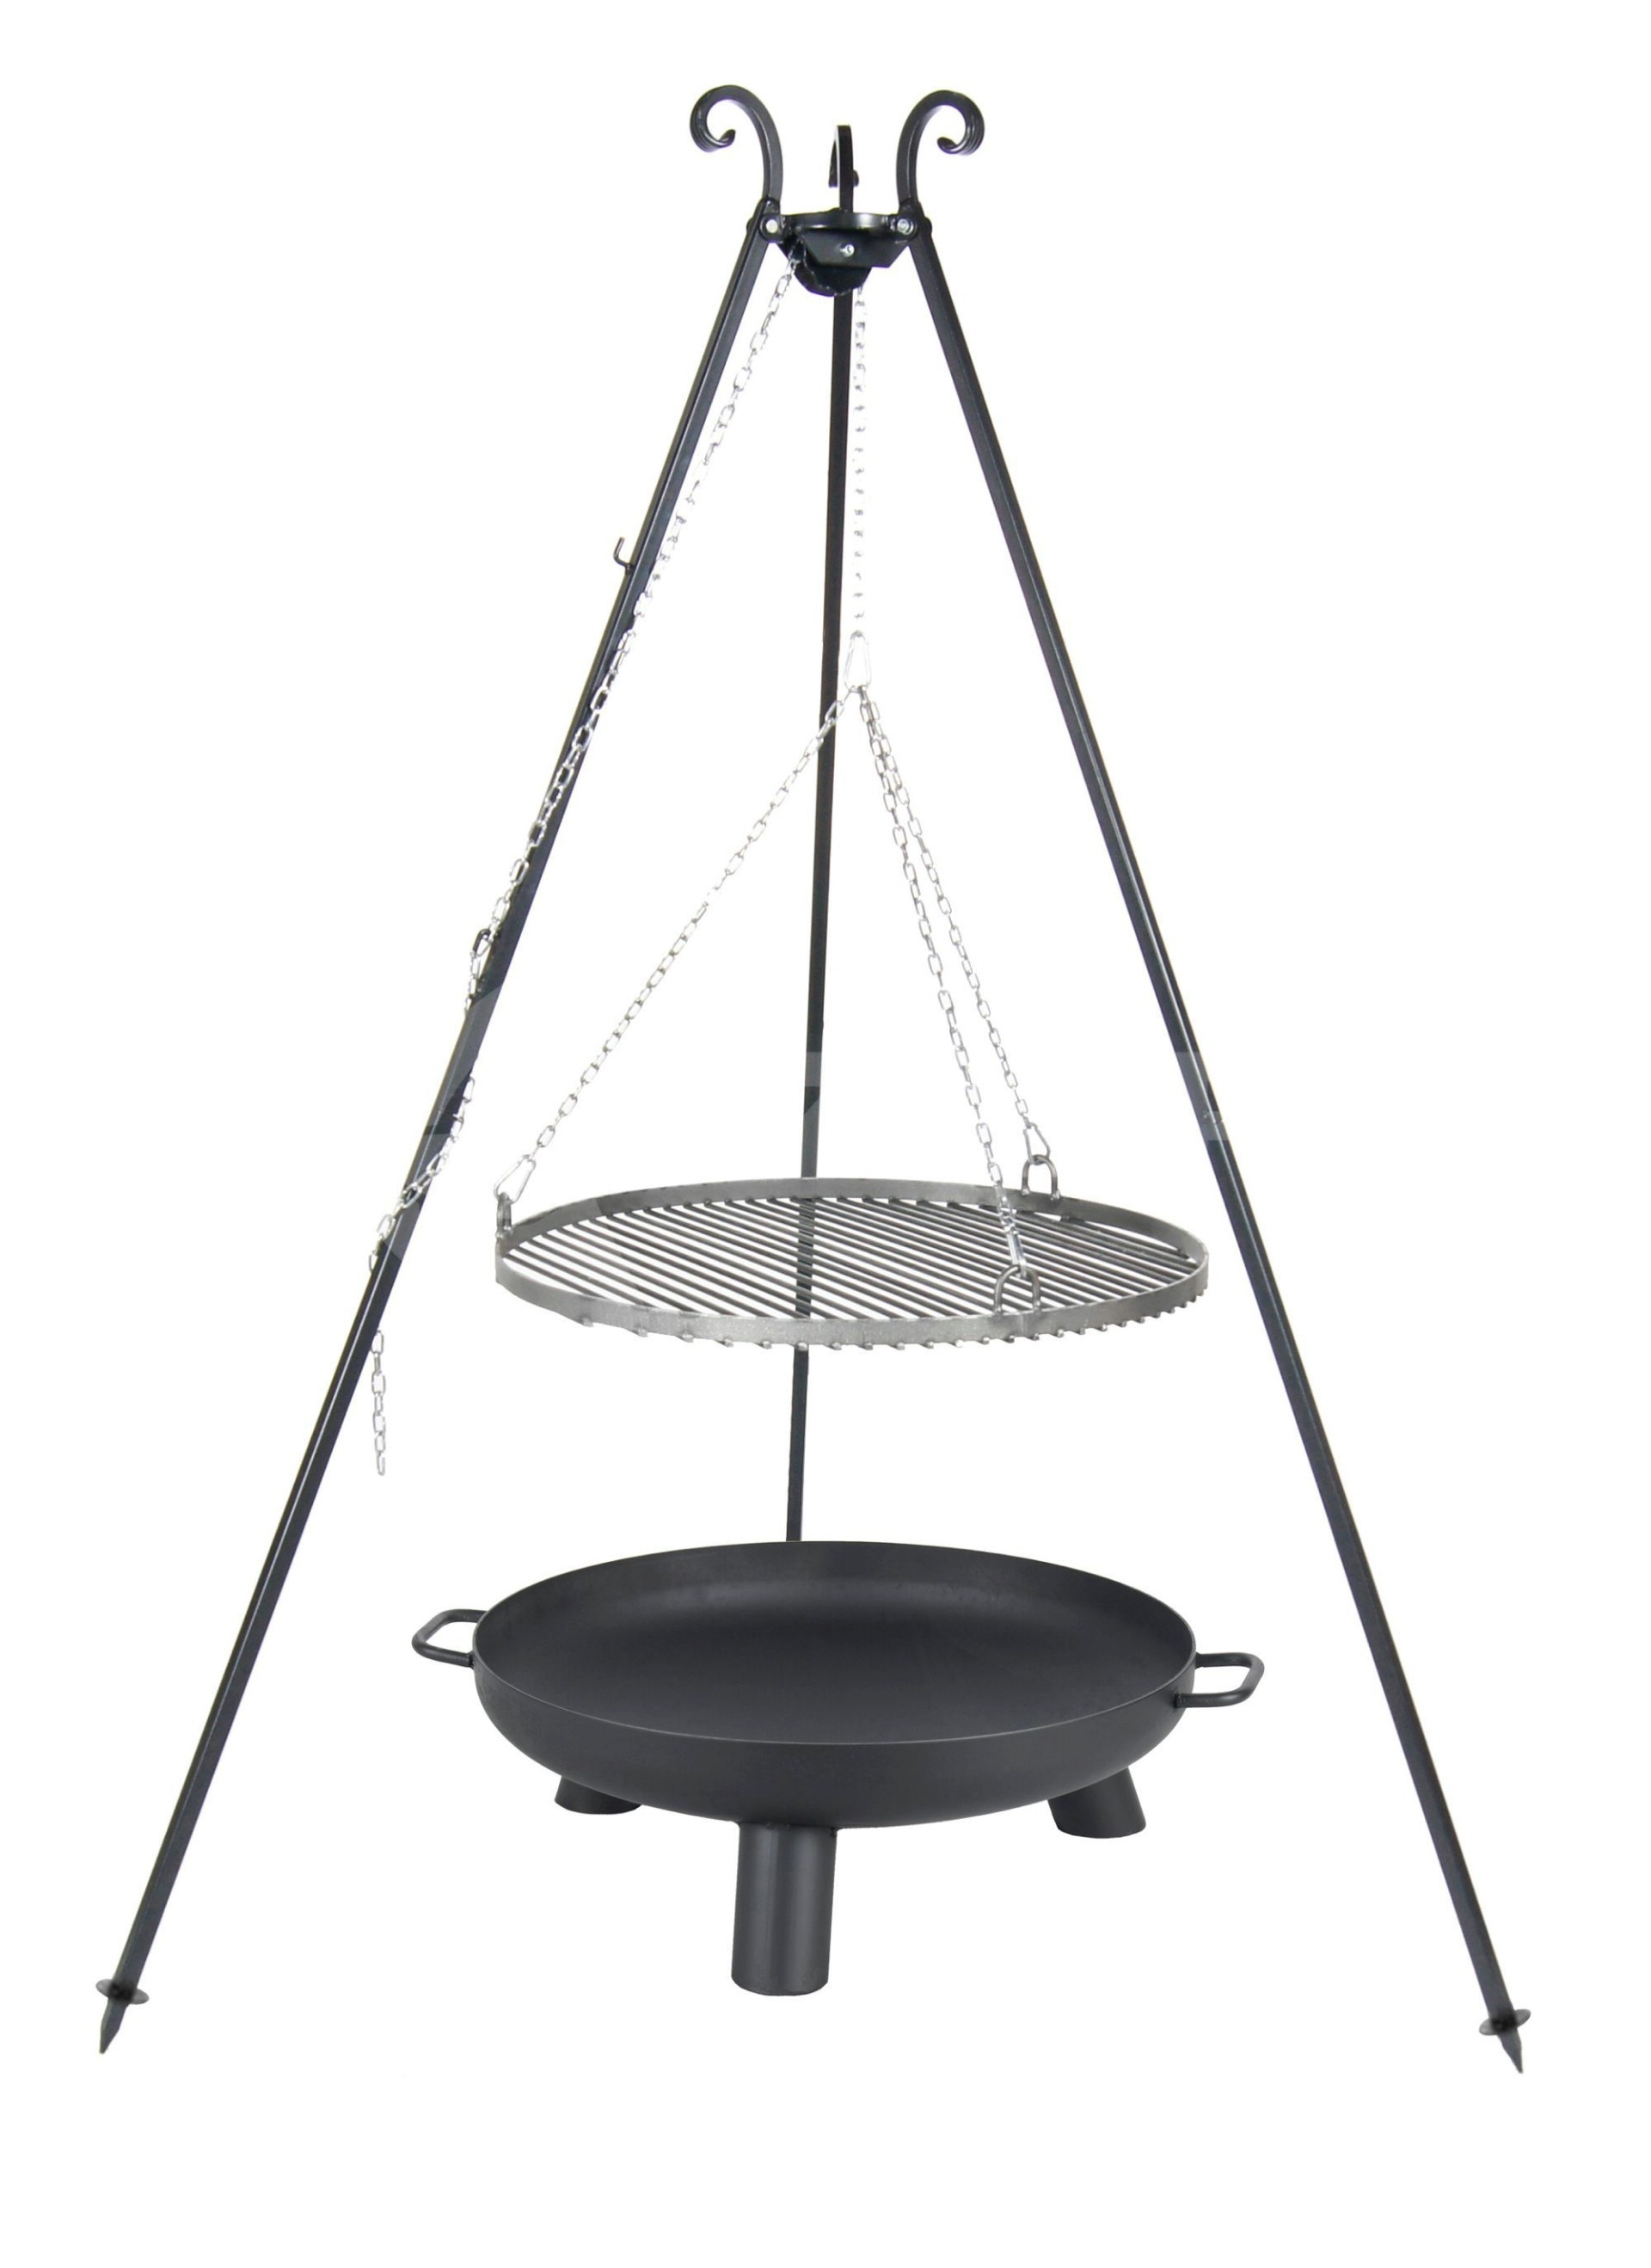 farmcook swing grill viking 70 cm vuurschaal pan37 80. Black Bedroom Furniture Sets. Home Design Ideas